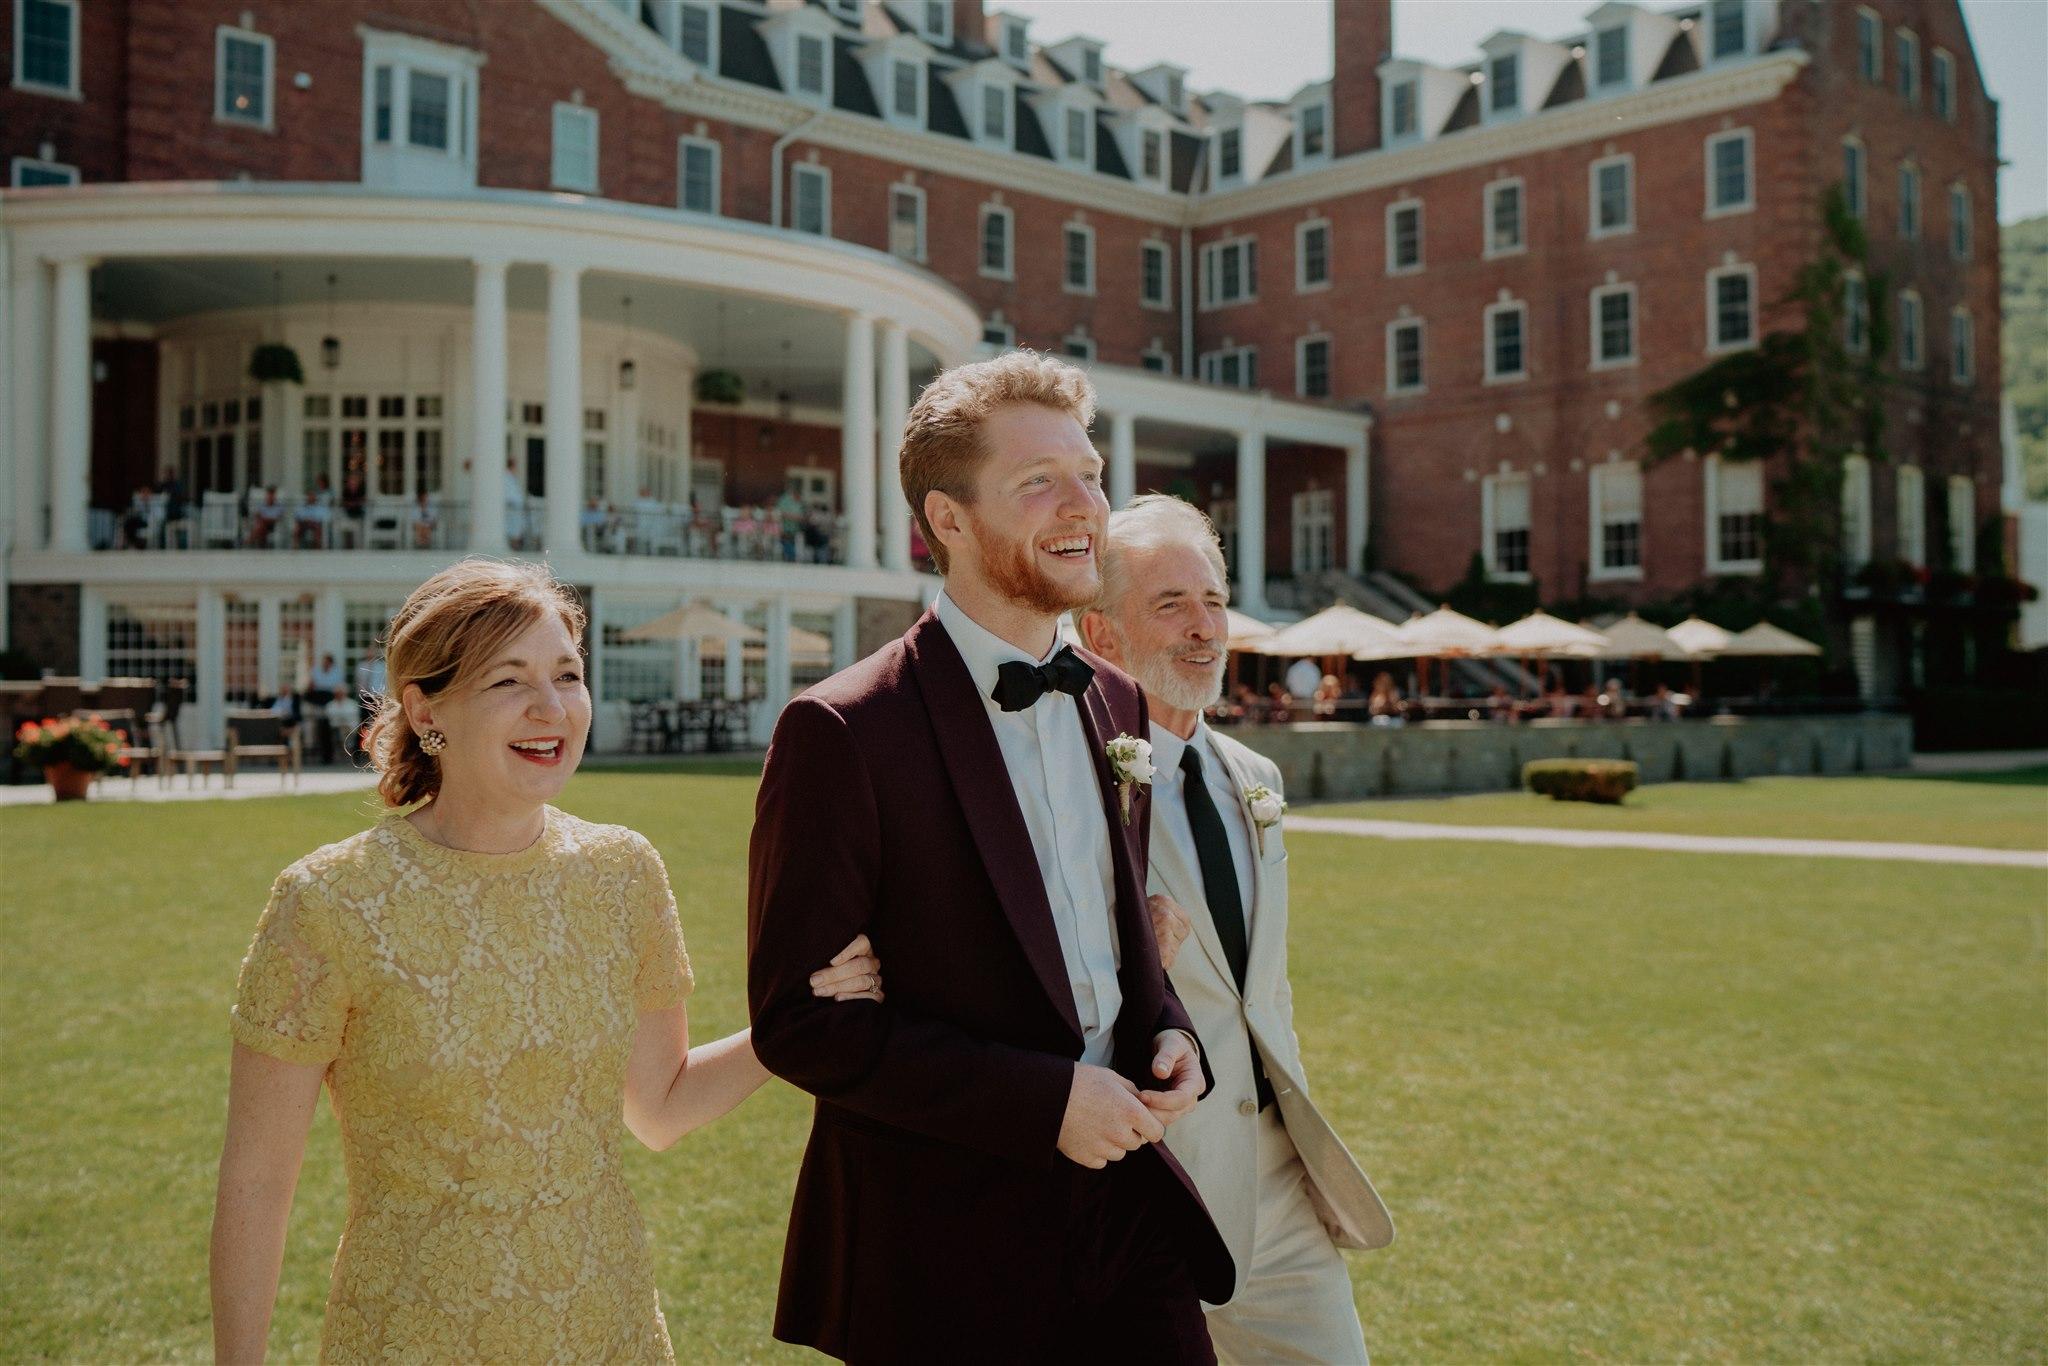 Chellise_Michael_Photography_Hudson_Valley_Wedding_Photographer_Otesaga_Hotel-3044.jpg